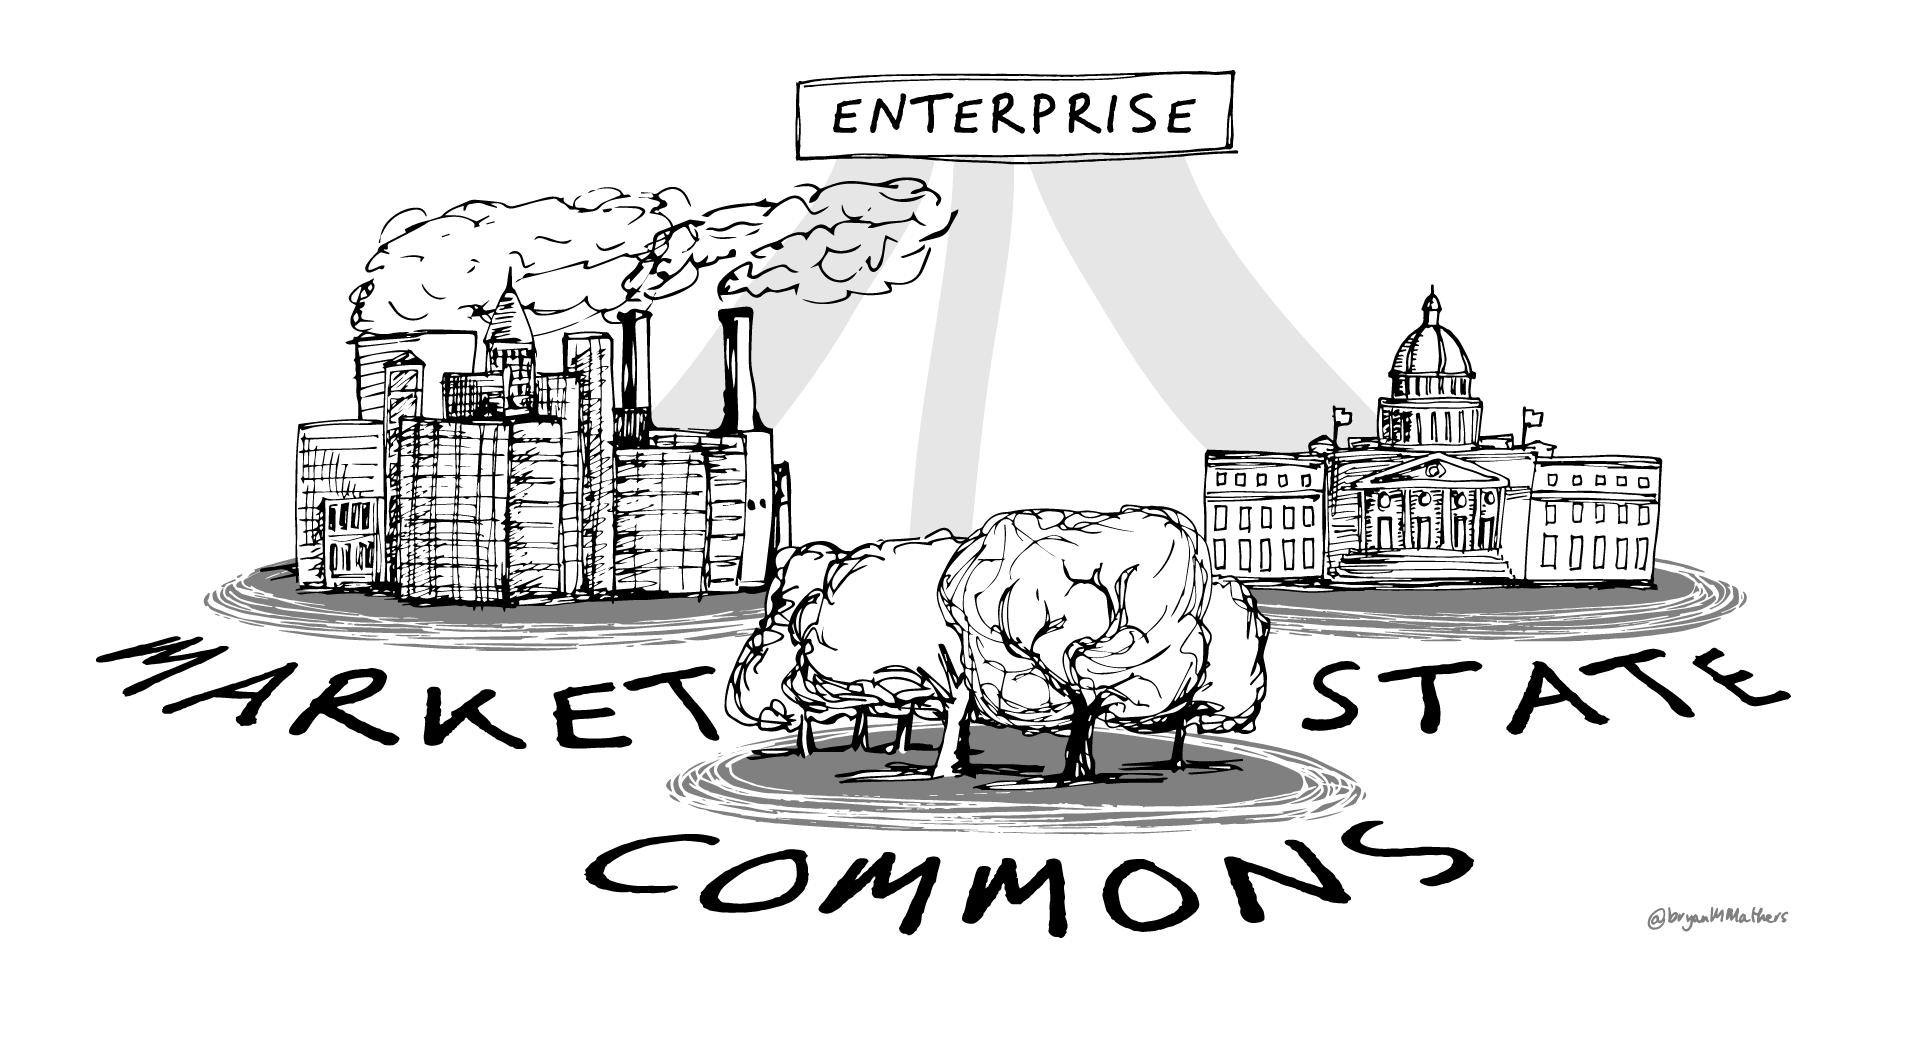 Enterprise - Market, State, Commons